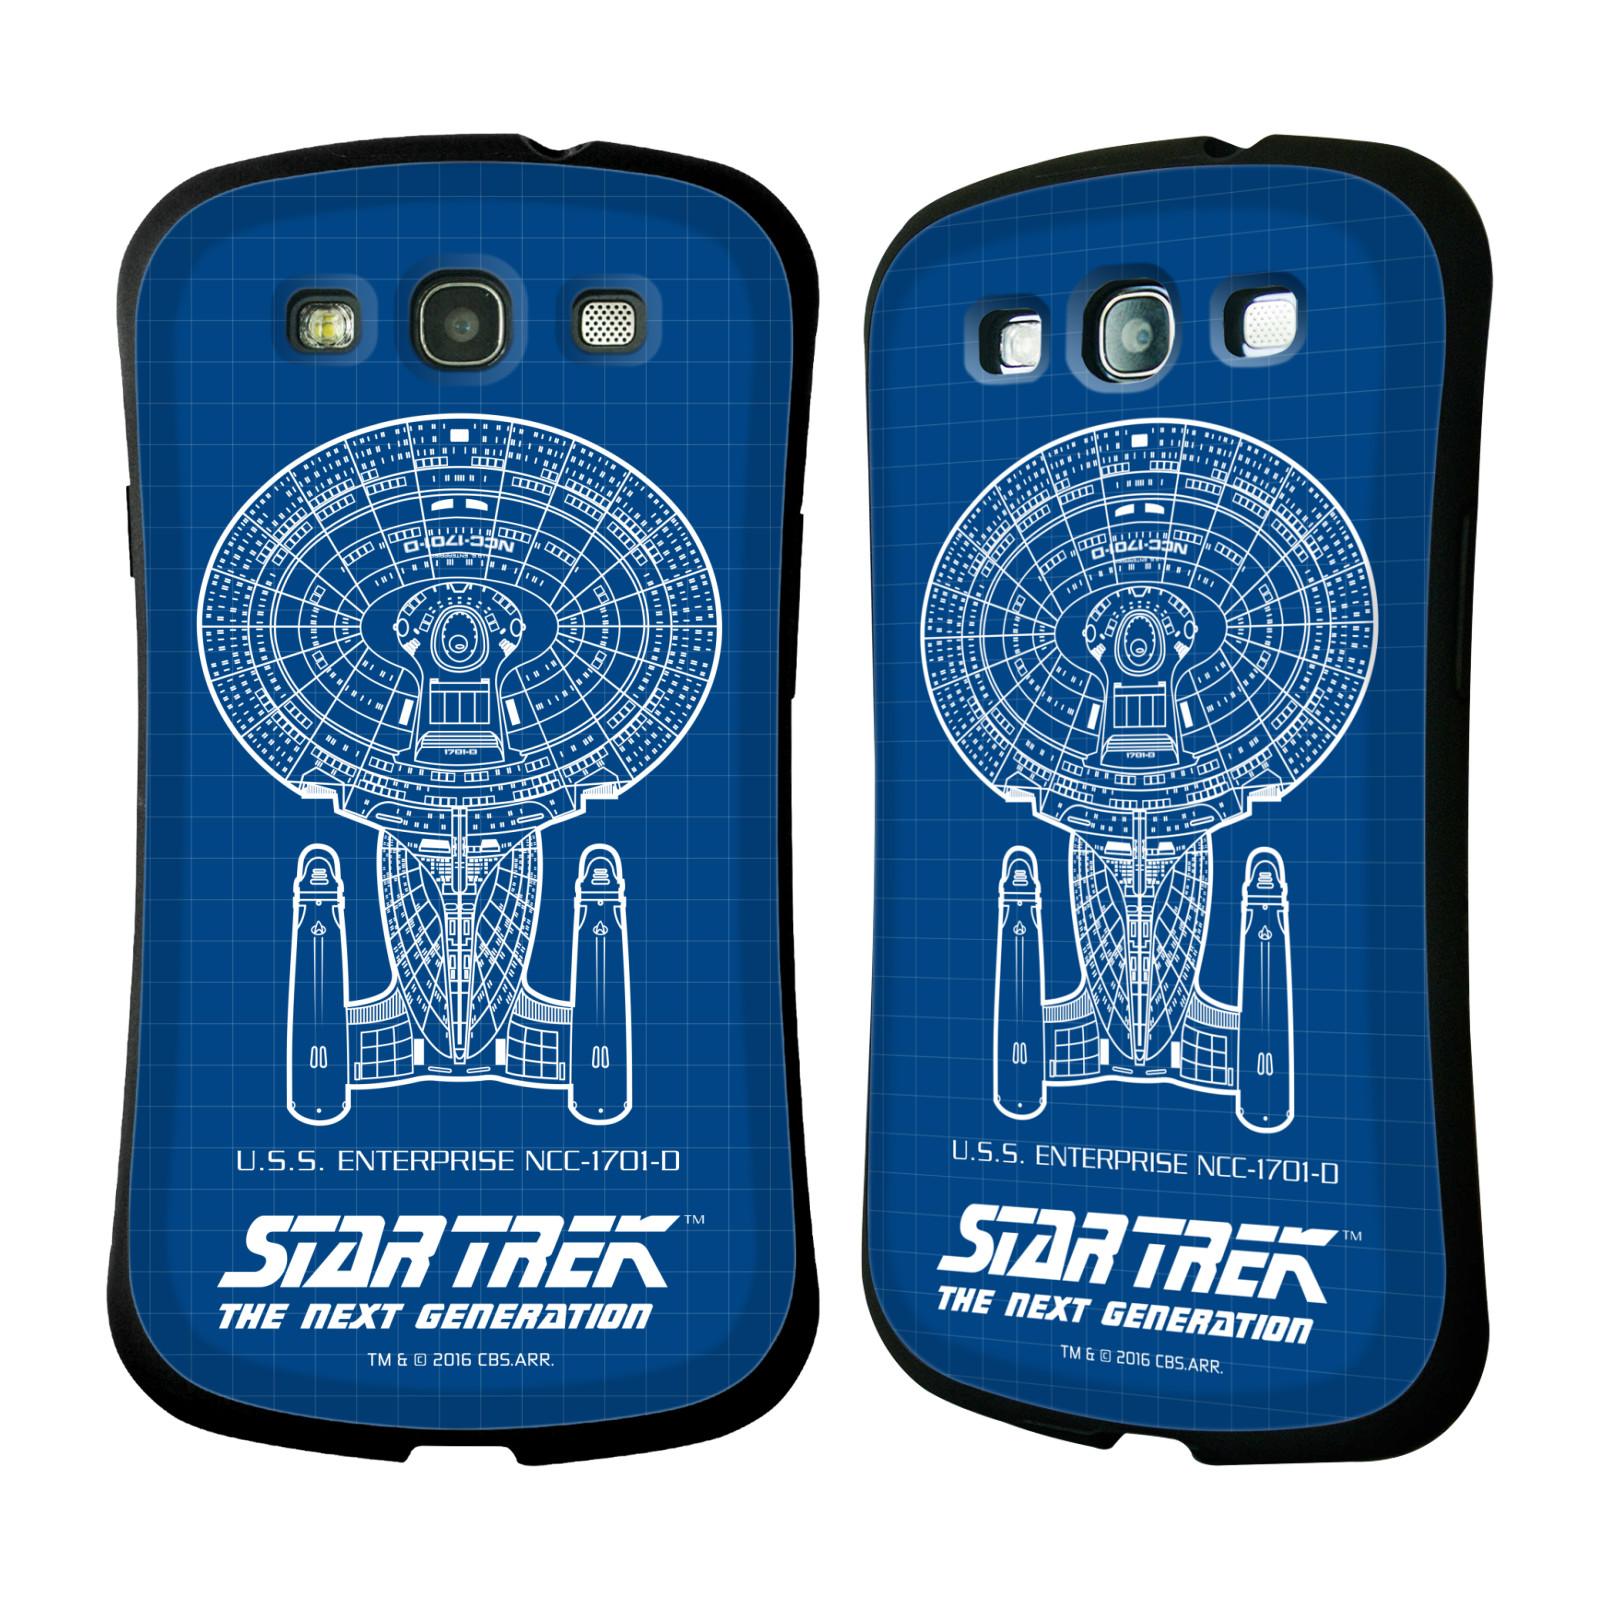 HEAD CASE silikon/plast odolný obal na mobil Samsung Galaxy S3 i9300 / S3 NEO Star Trek vesmírná loď nákres USS Enterprise NCC-1701-D modrá